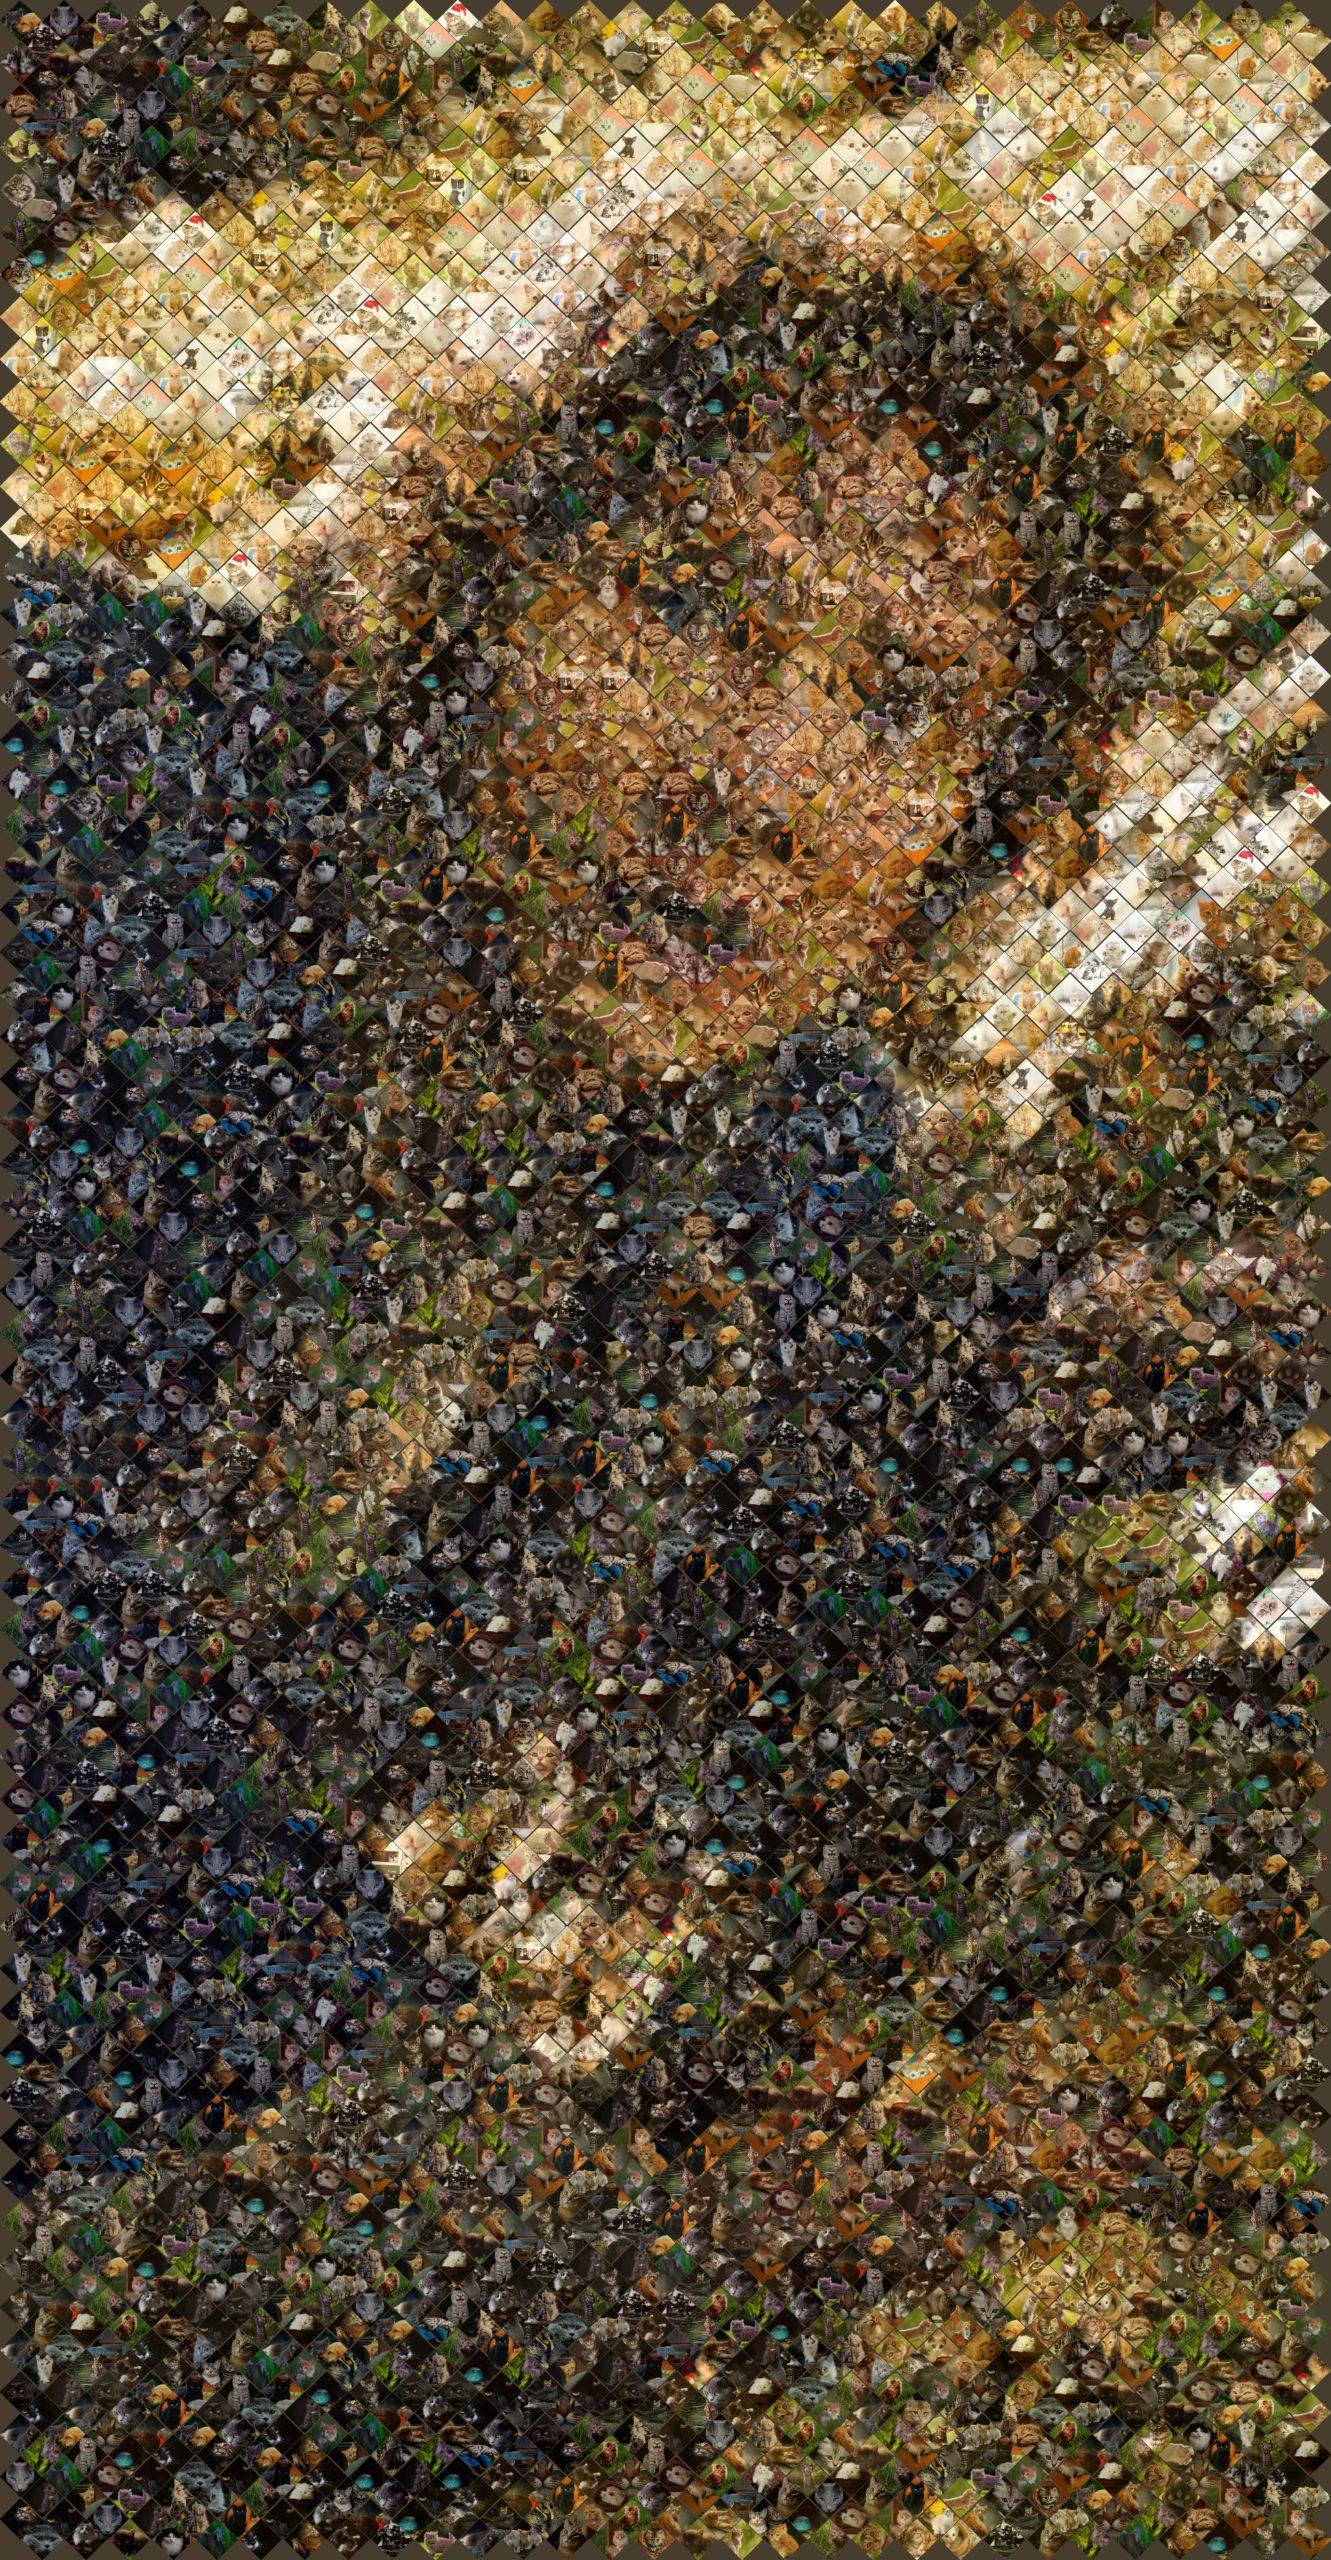 mosaic of bilbo bagins in kittens